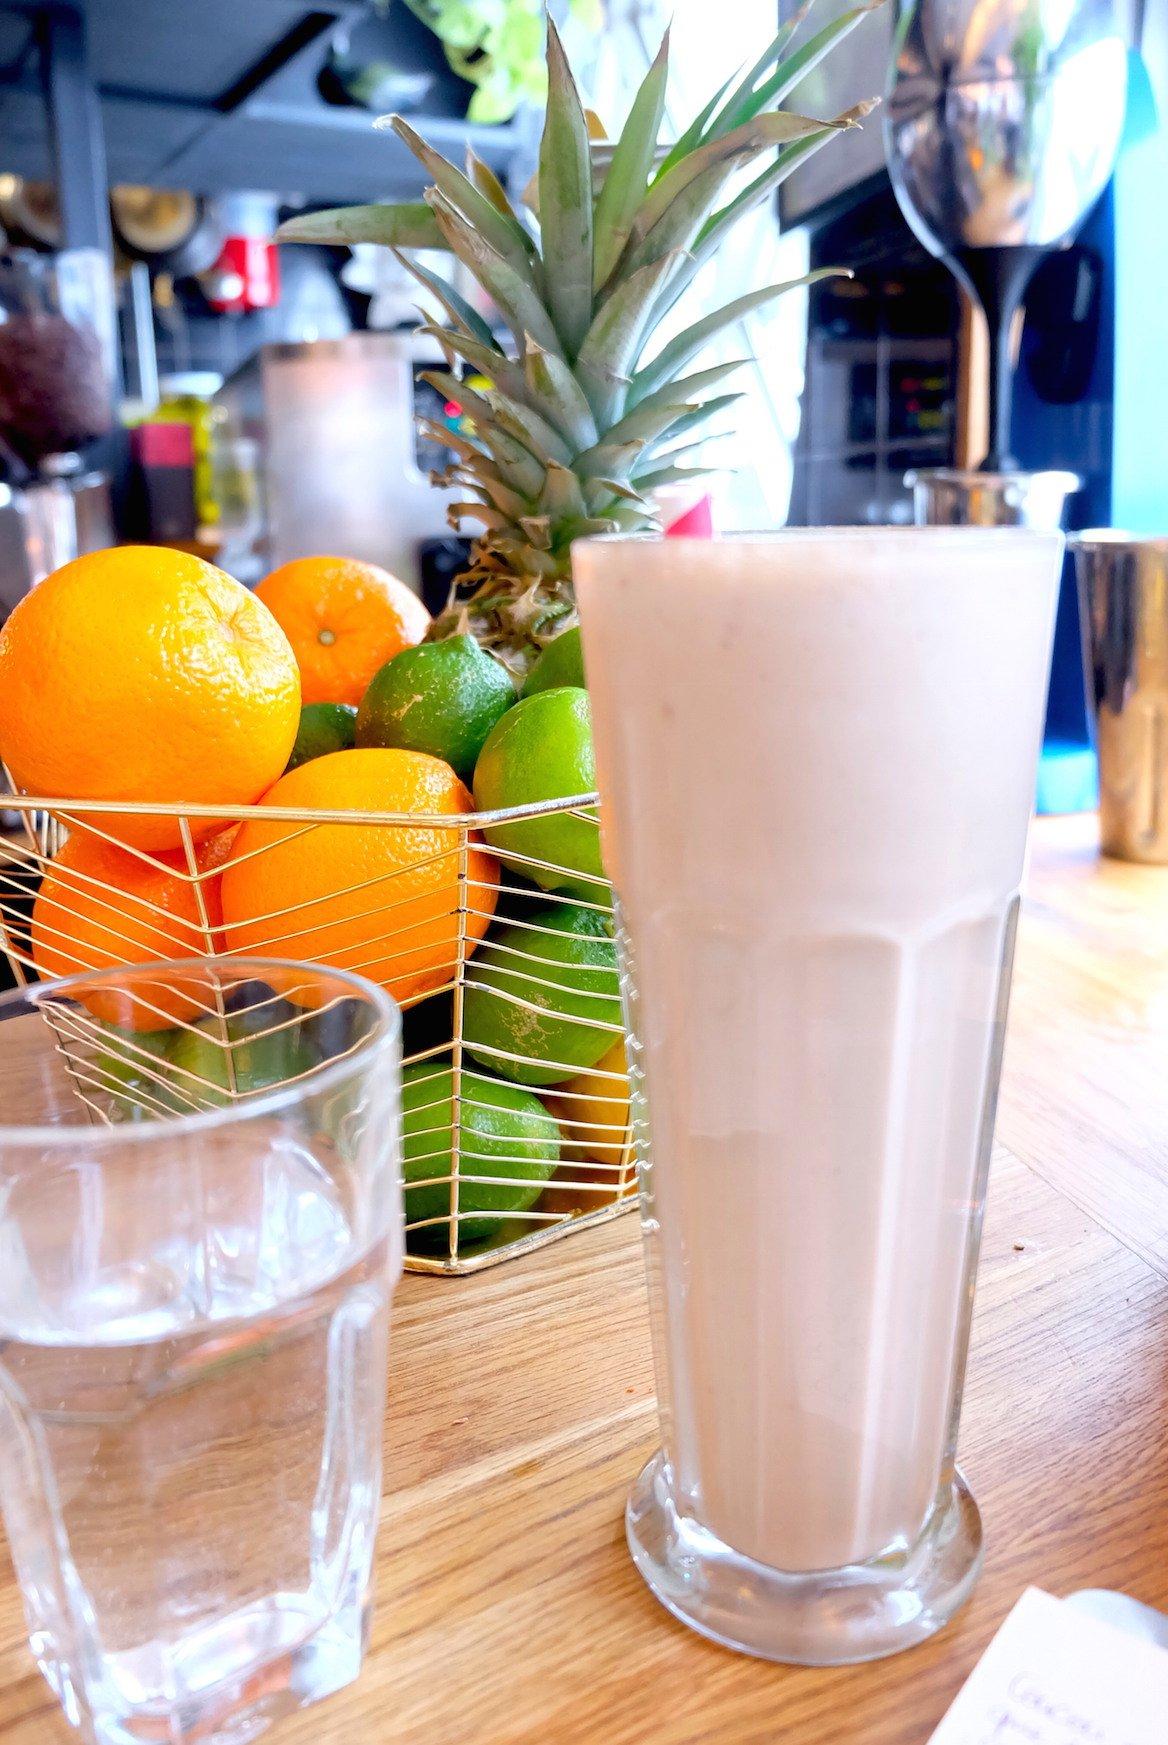 milkshake-fruits-montreal-canada-quebec